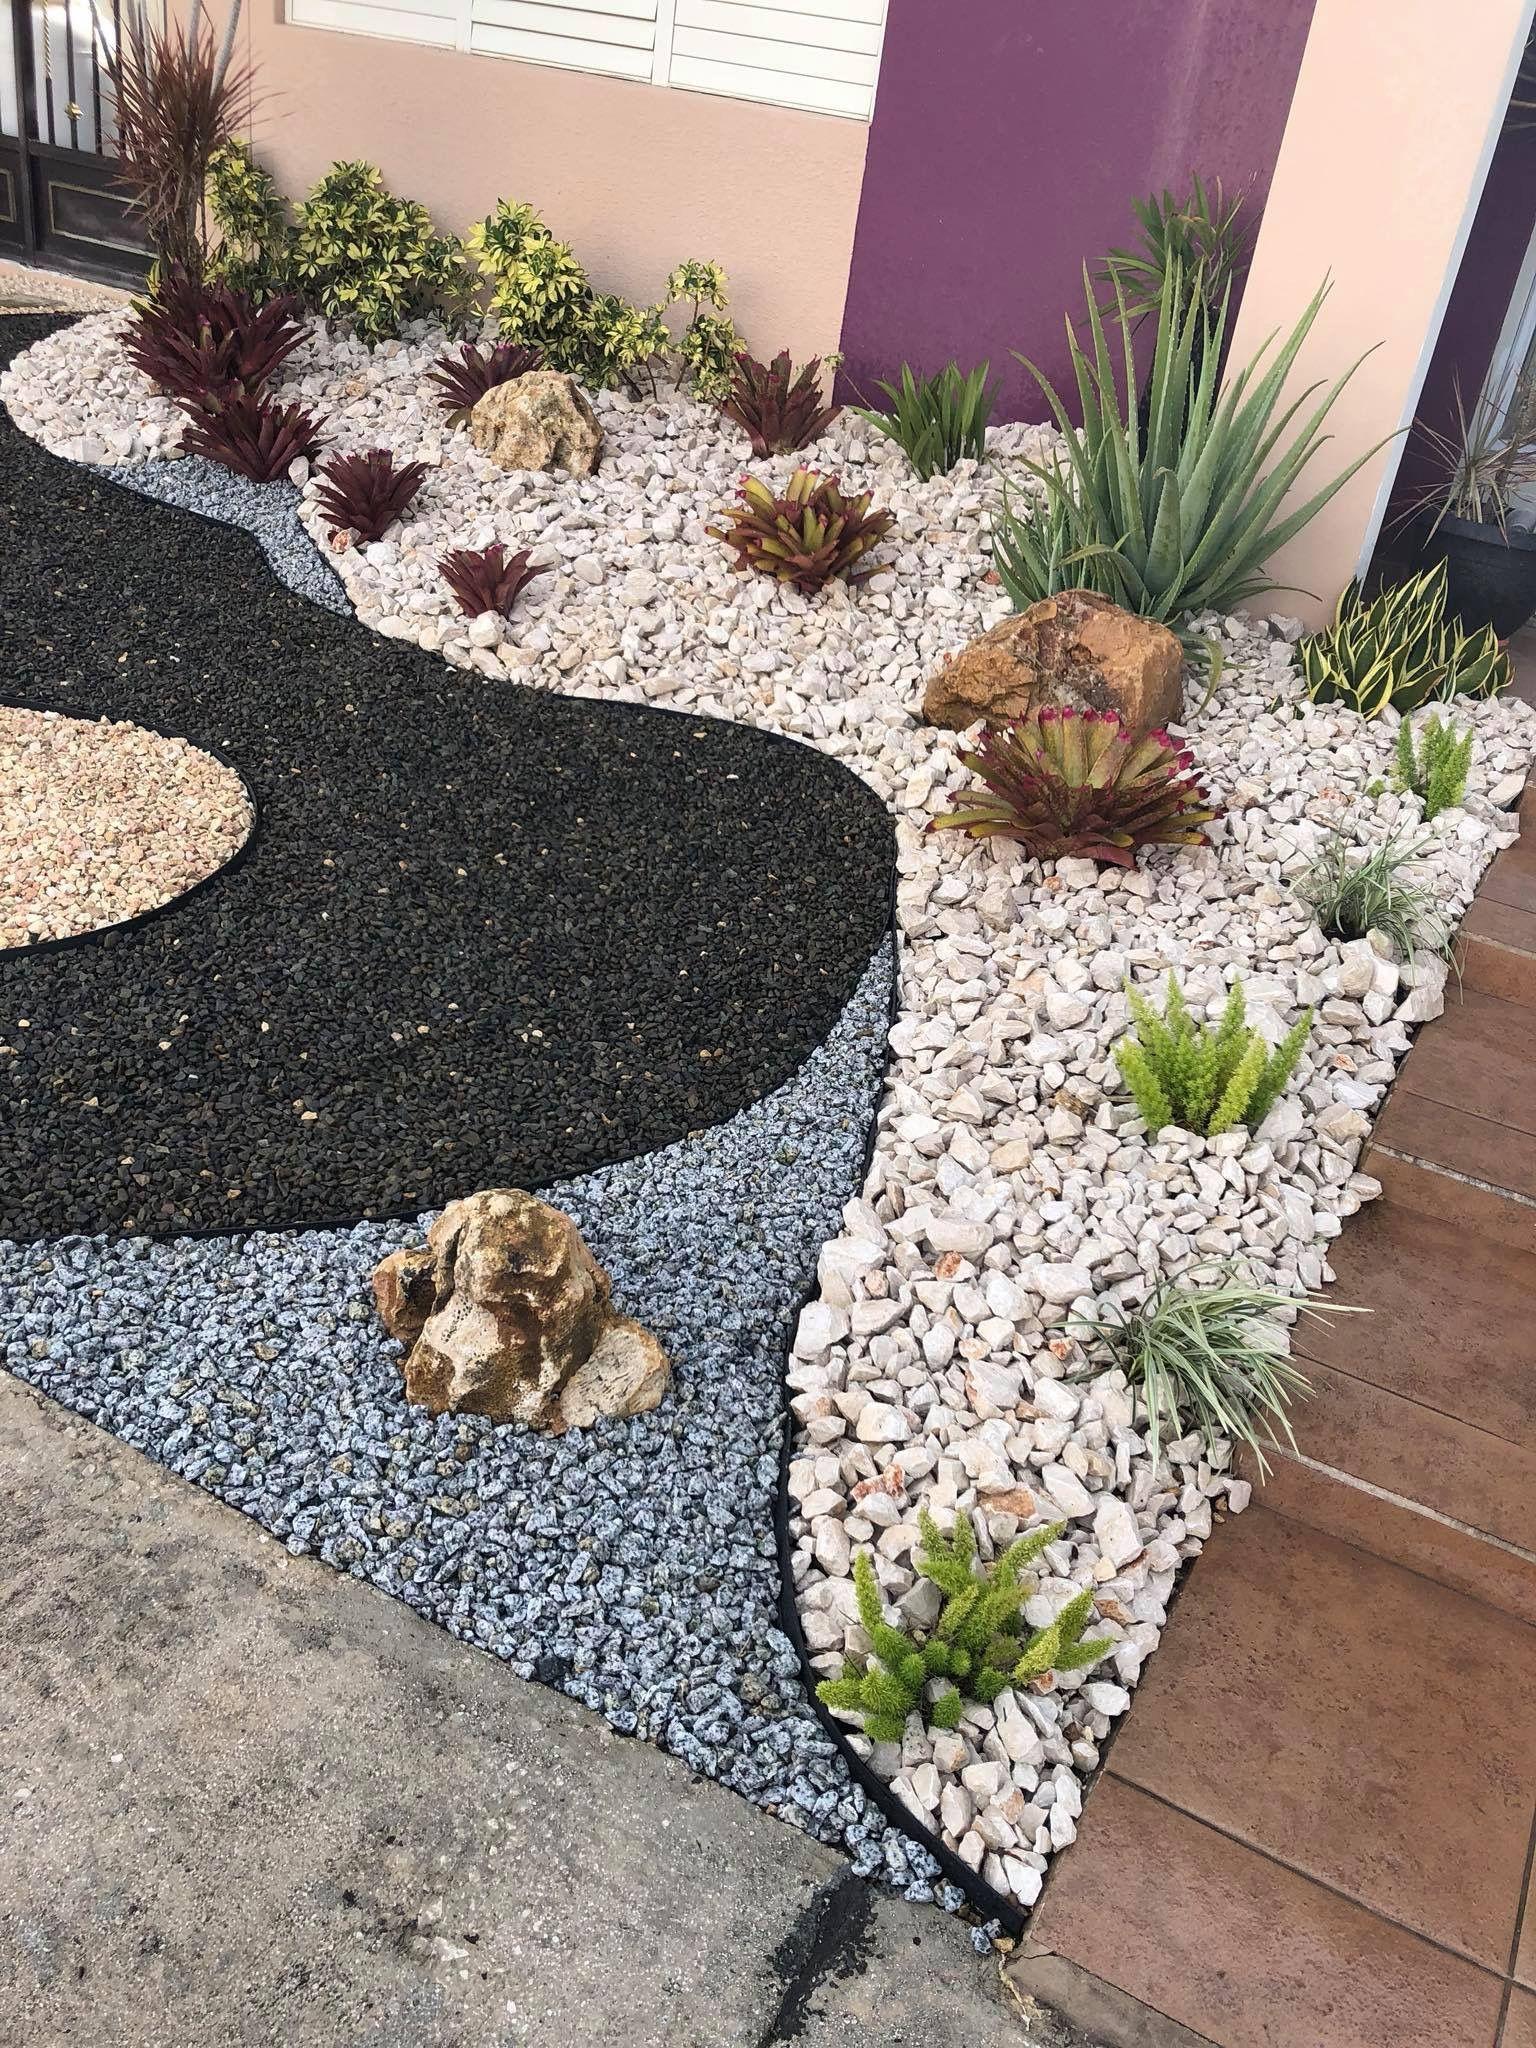 Pin by Desiree Ramos on Landscape ideas | Garden design ... on Gravel Front Yard Ideas id=81906